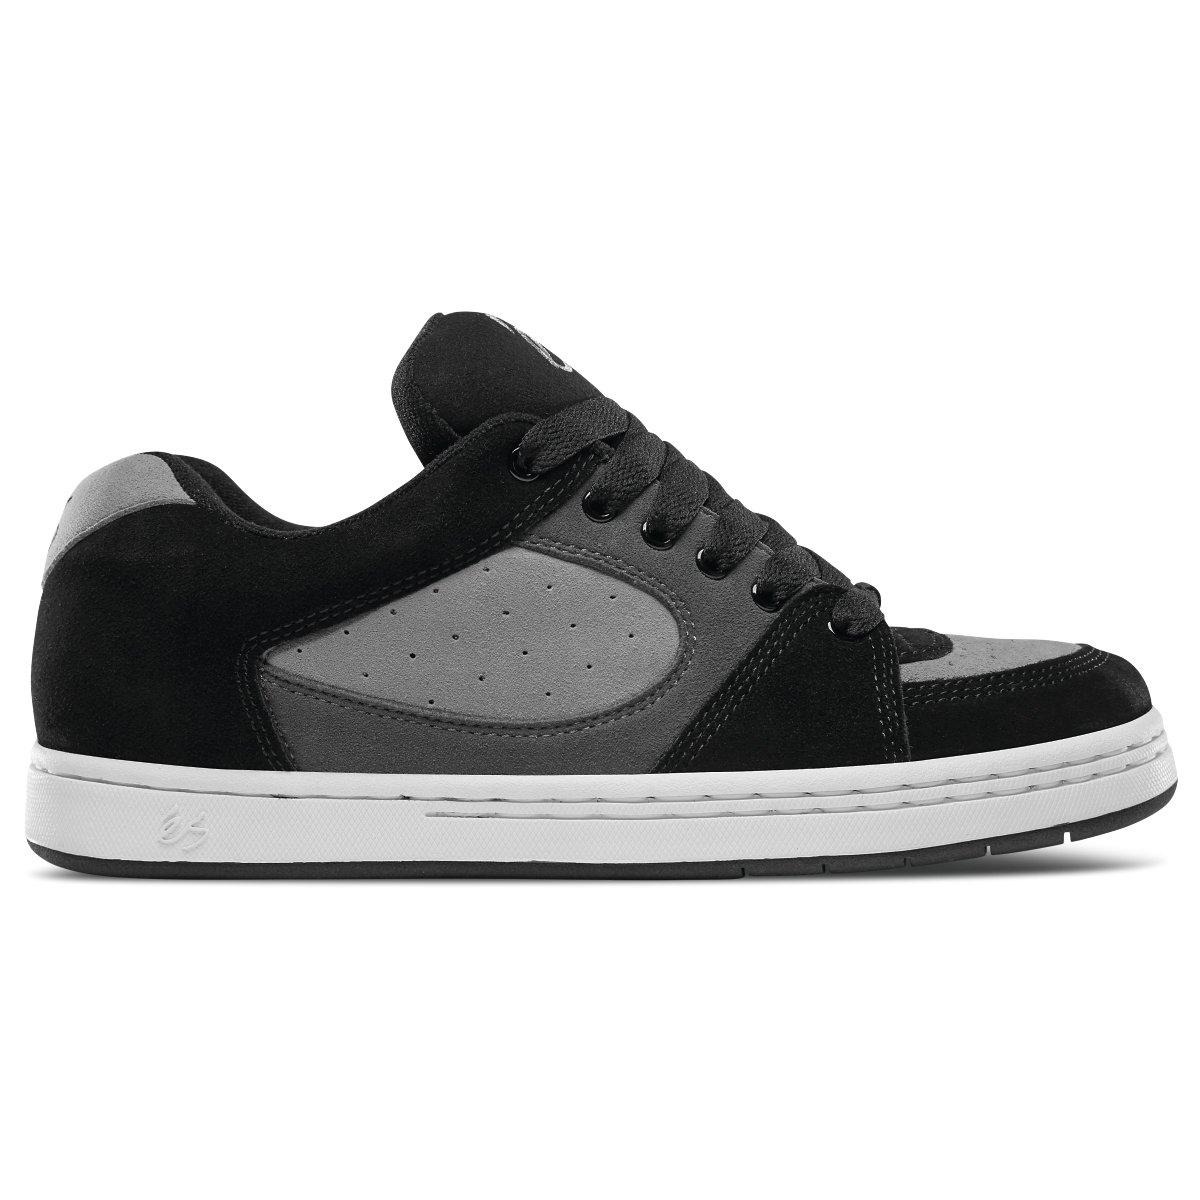 negro Y gris eS Accel Og negro